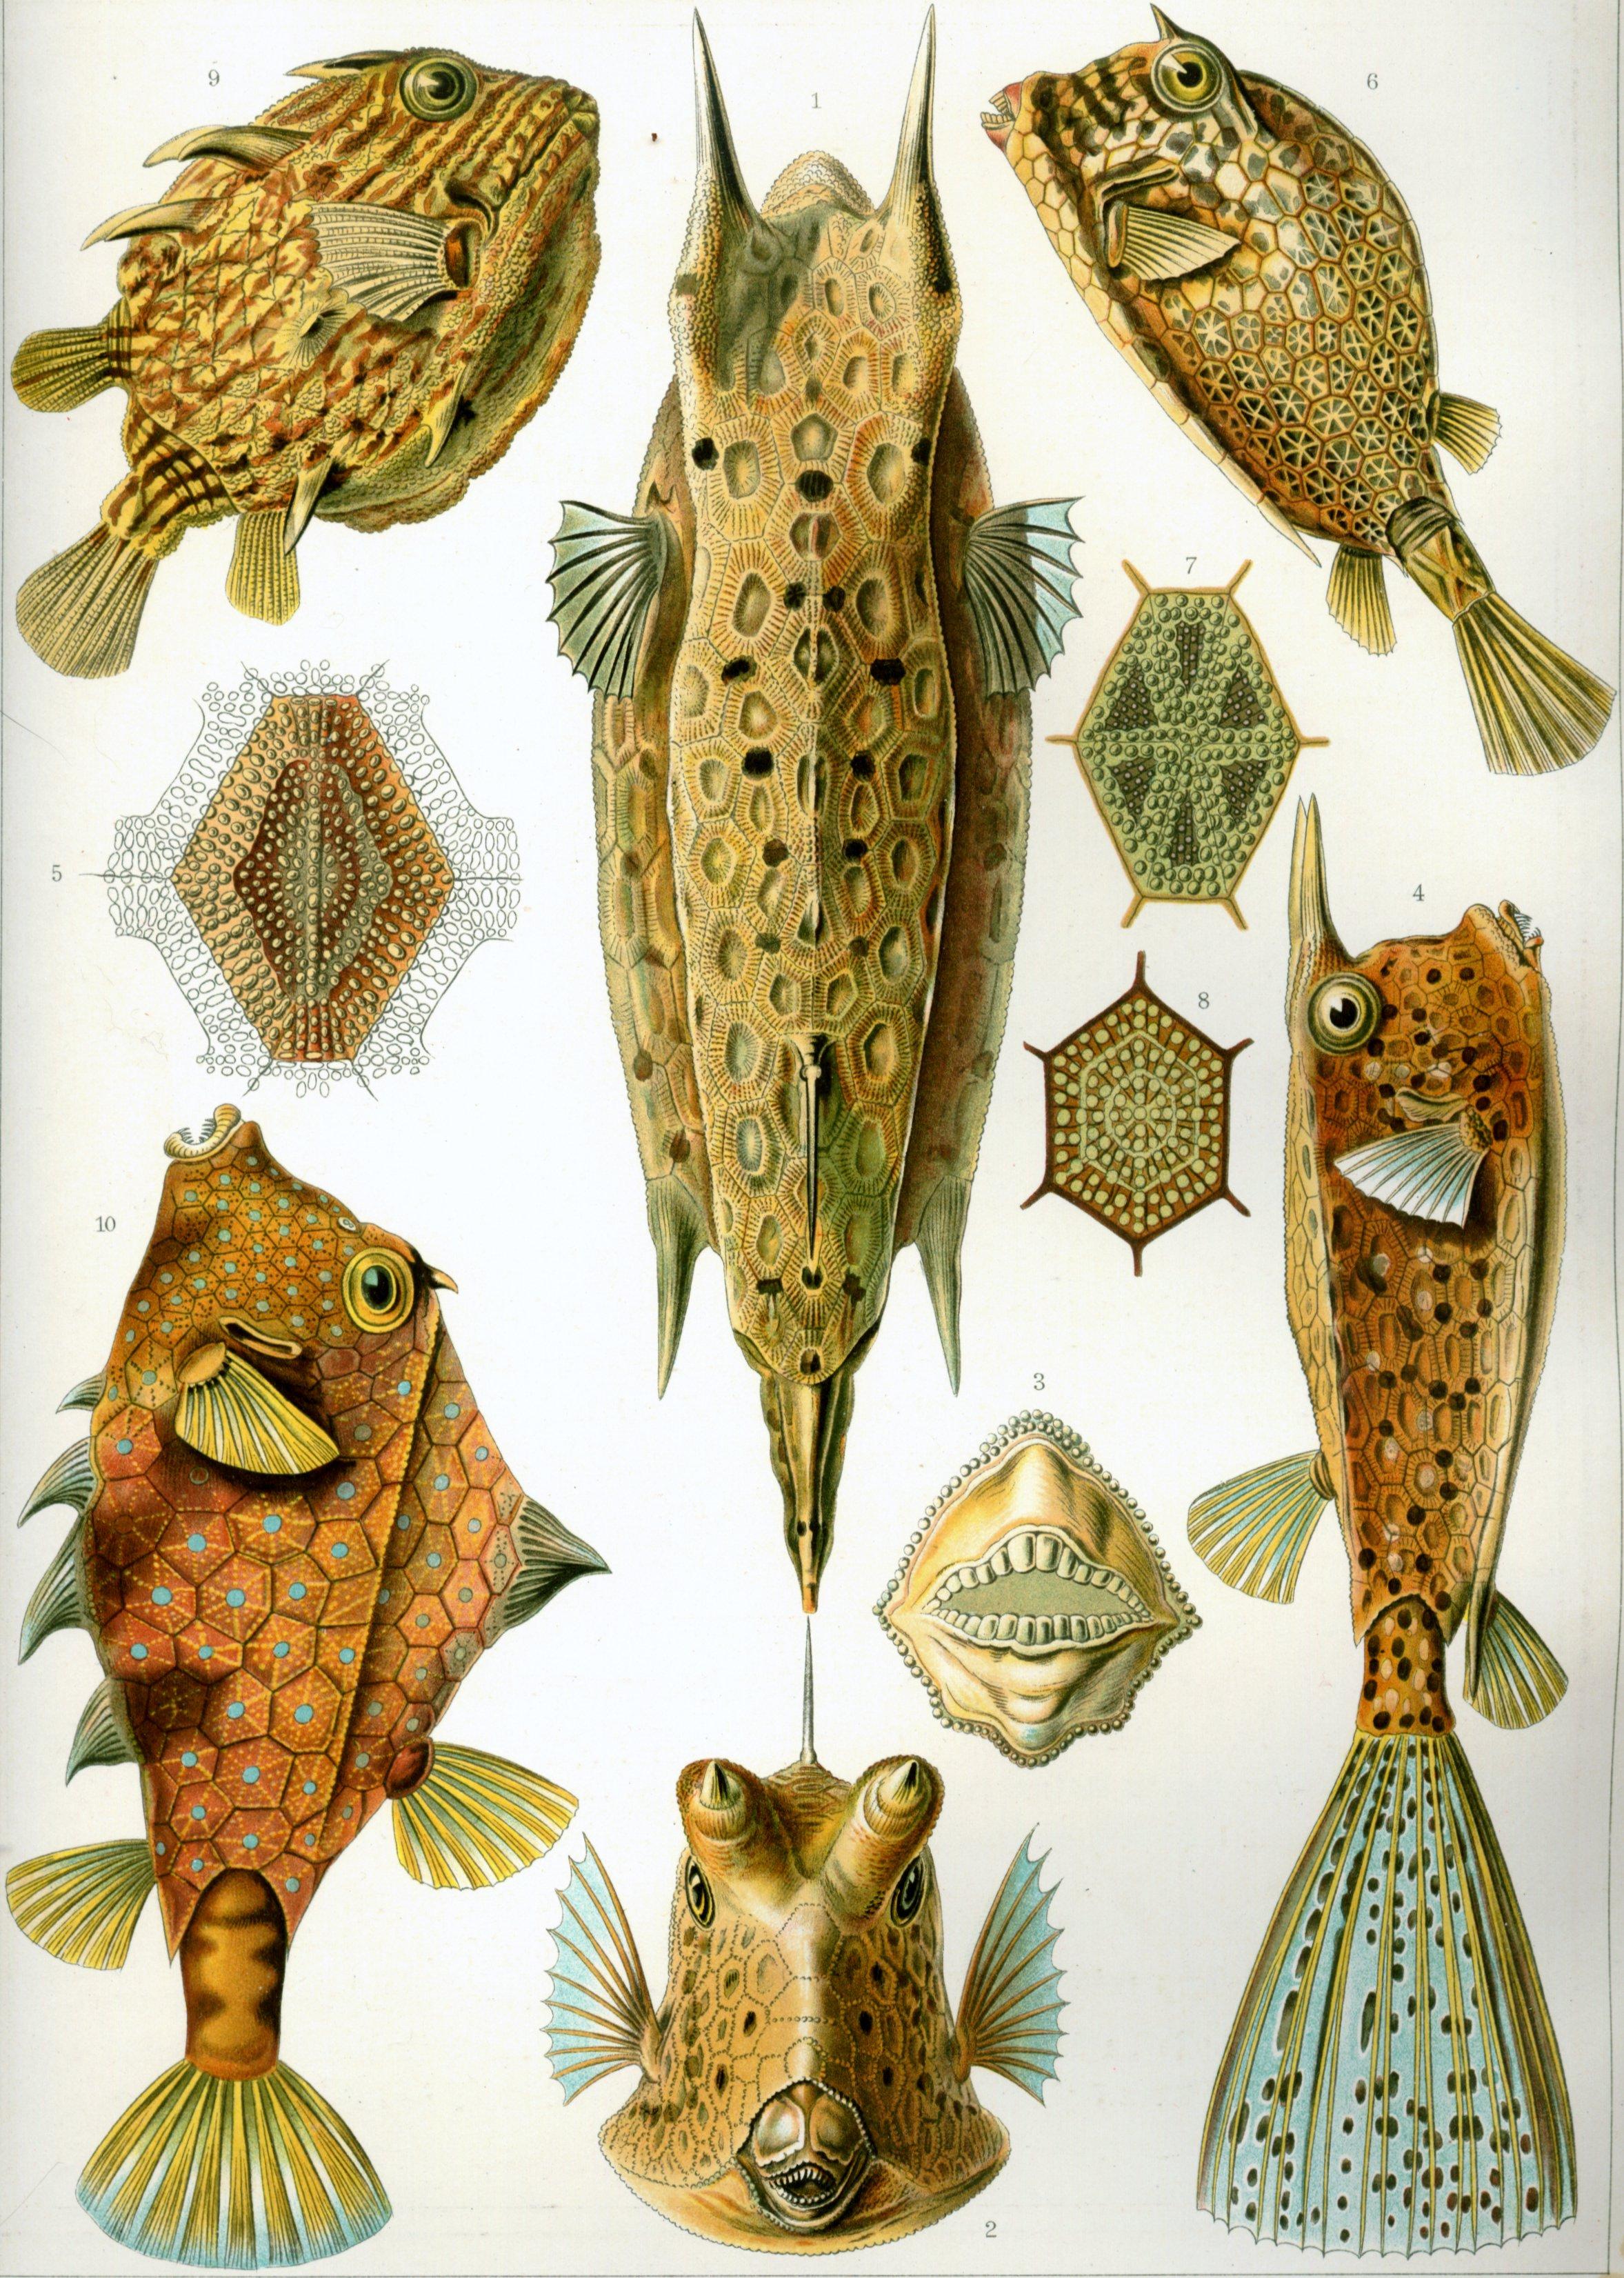 Haeckel-Ostraciontes